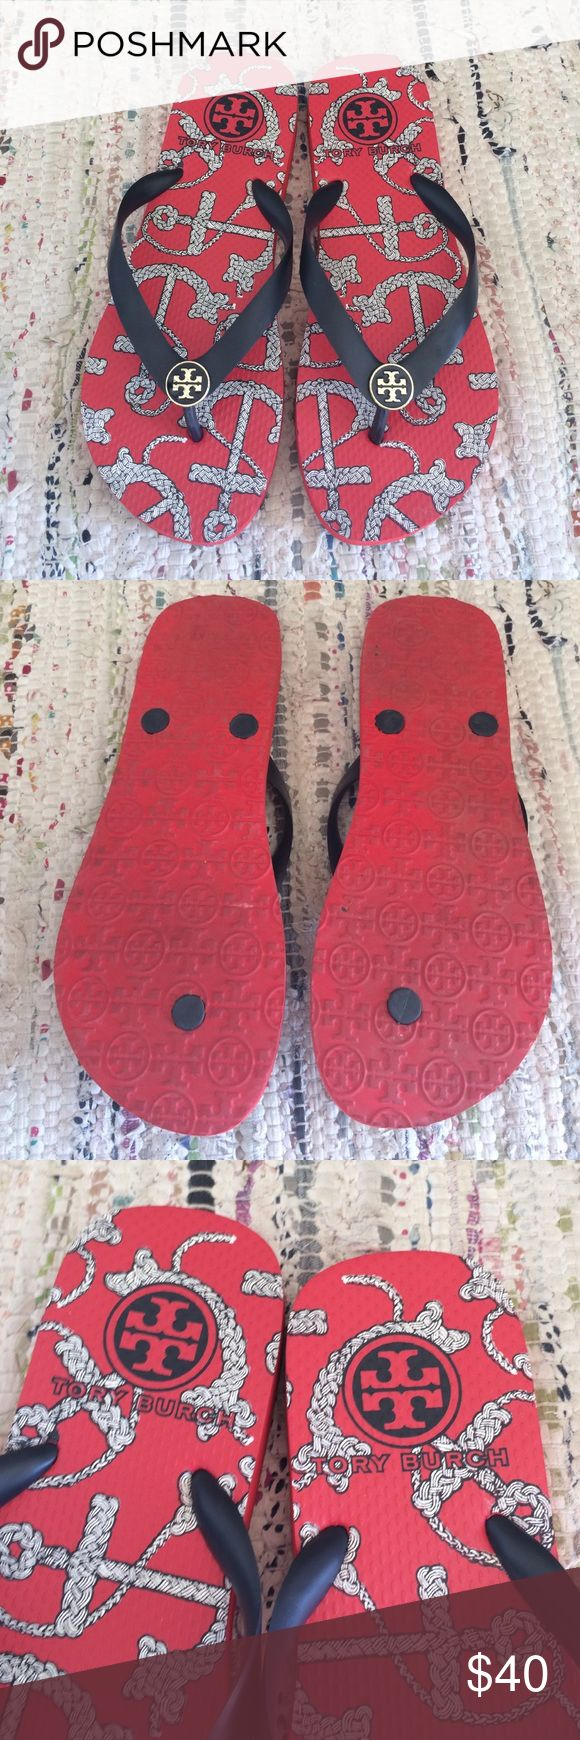 Tory Burch Nautical Rubber Flip Flops! Tory Burch Nautical Rubber Flip Flops! Tory Burch Shoes Sandals